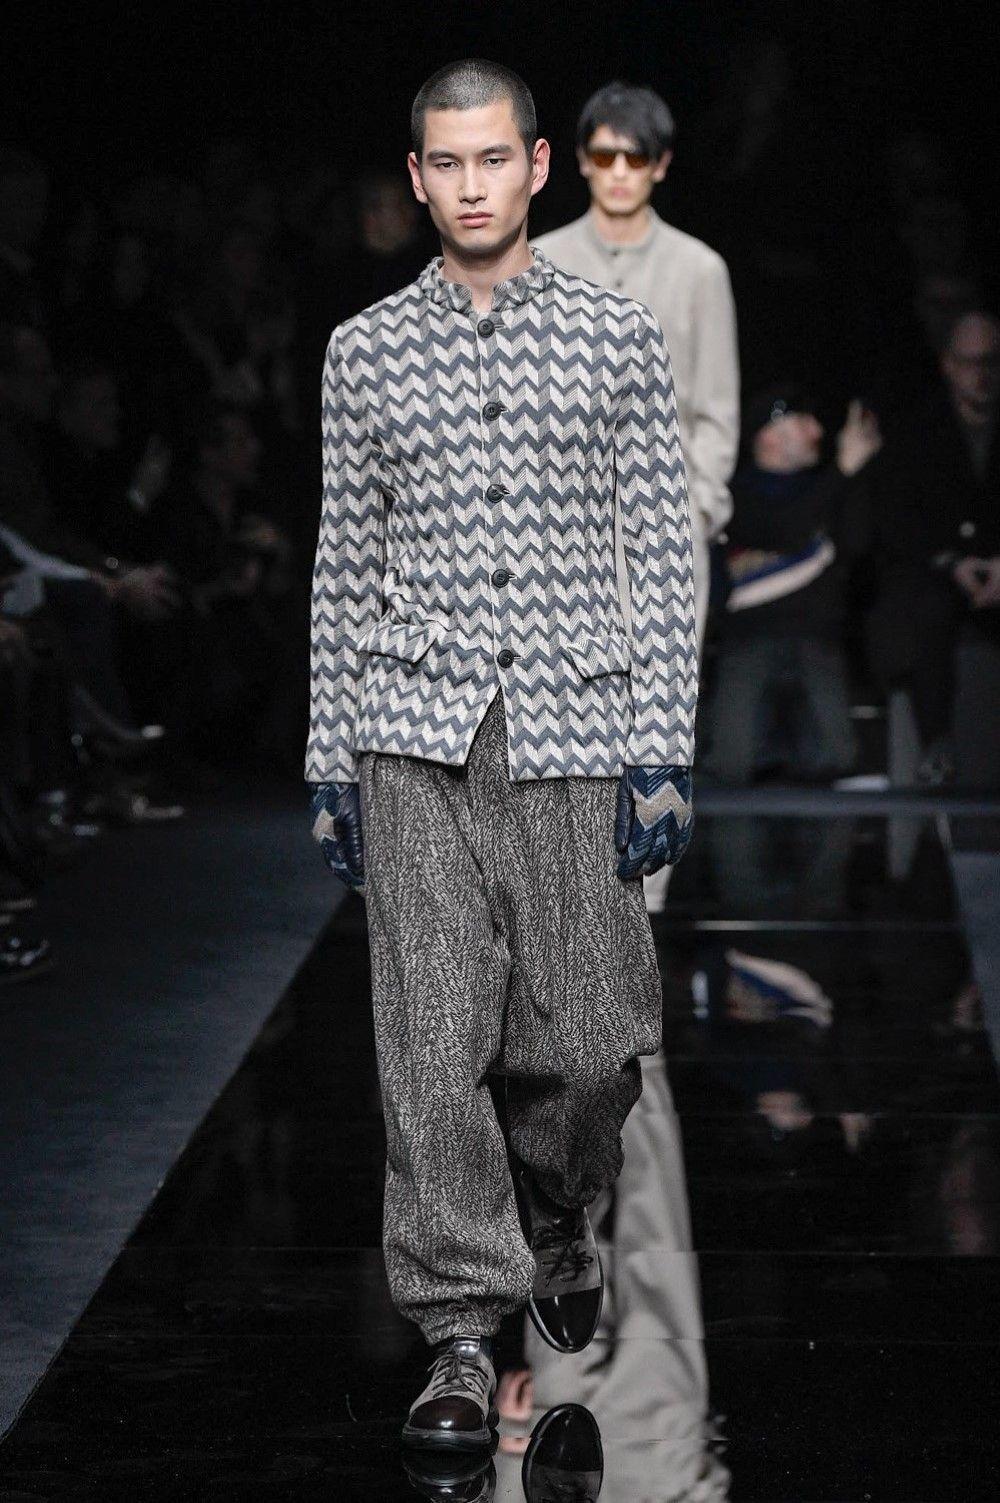 Giorgio Armani – Fall / Winter 2020 2021 – Milano Fashion Week